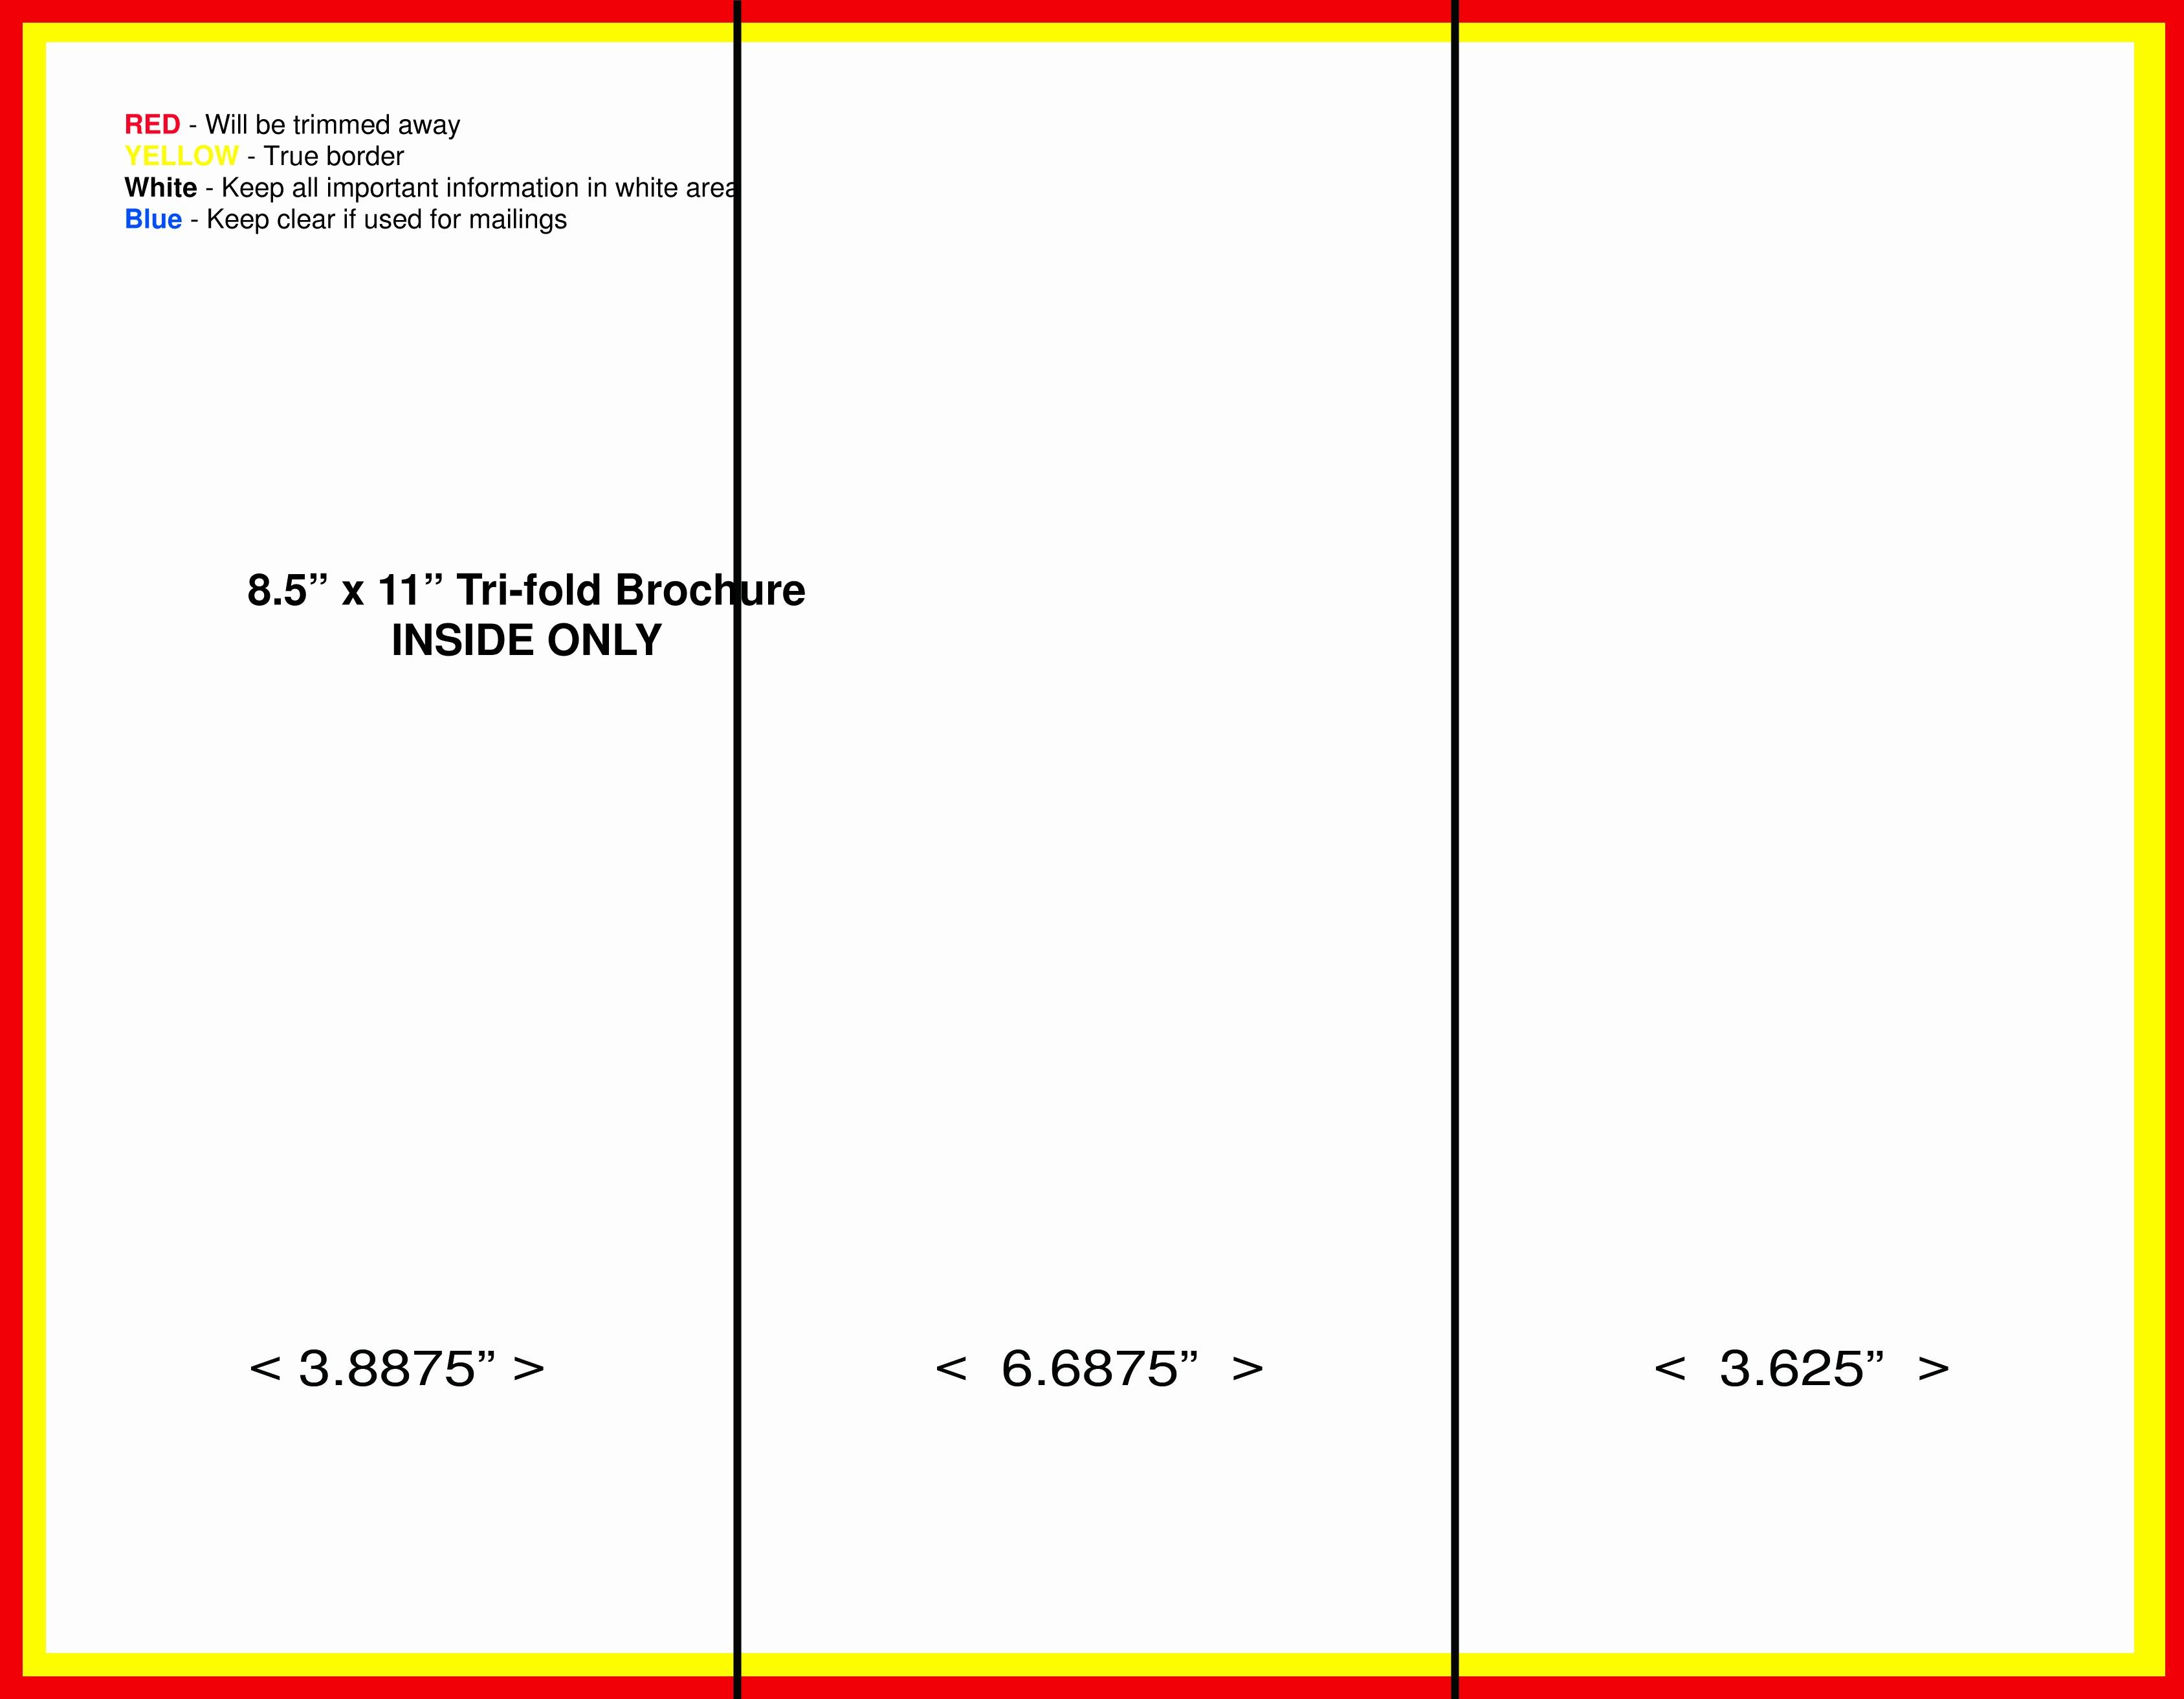 Microsoft Word Flyer Templates Free Luxury Tri Fold Brochure Template Microsoft Word